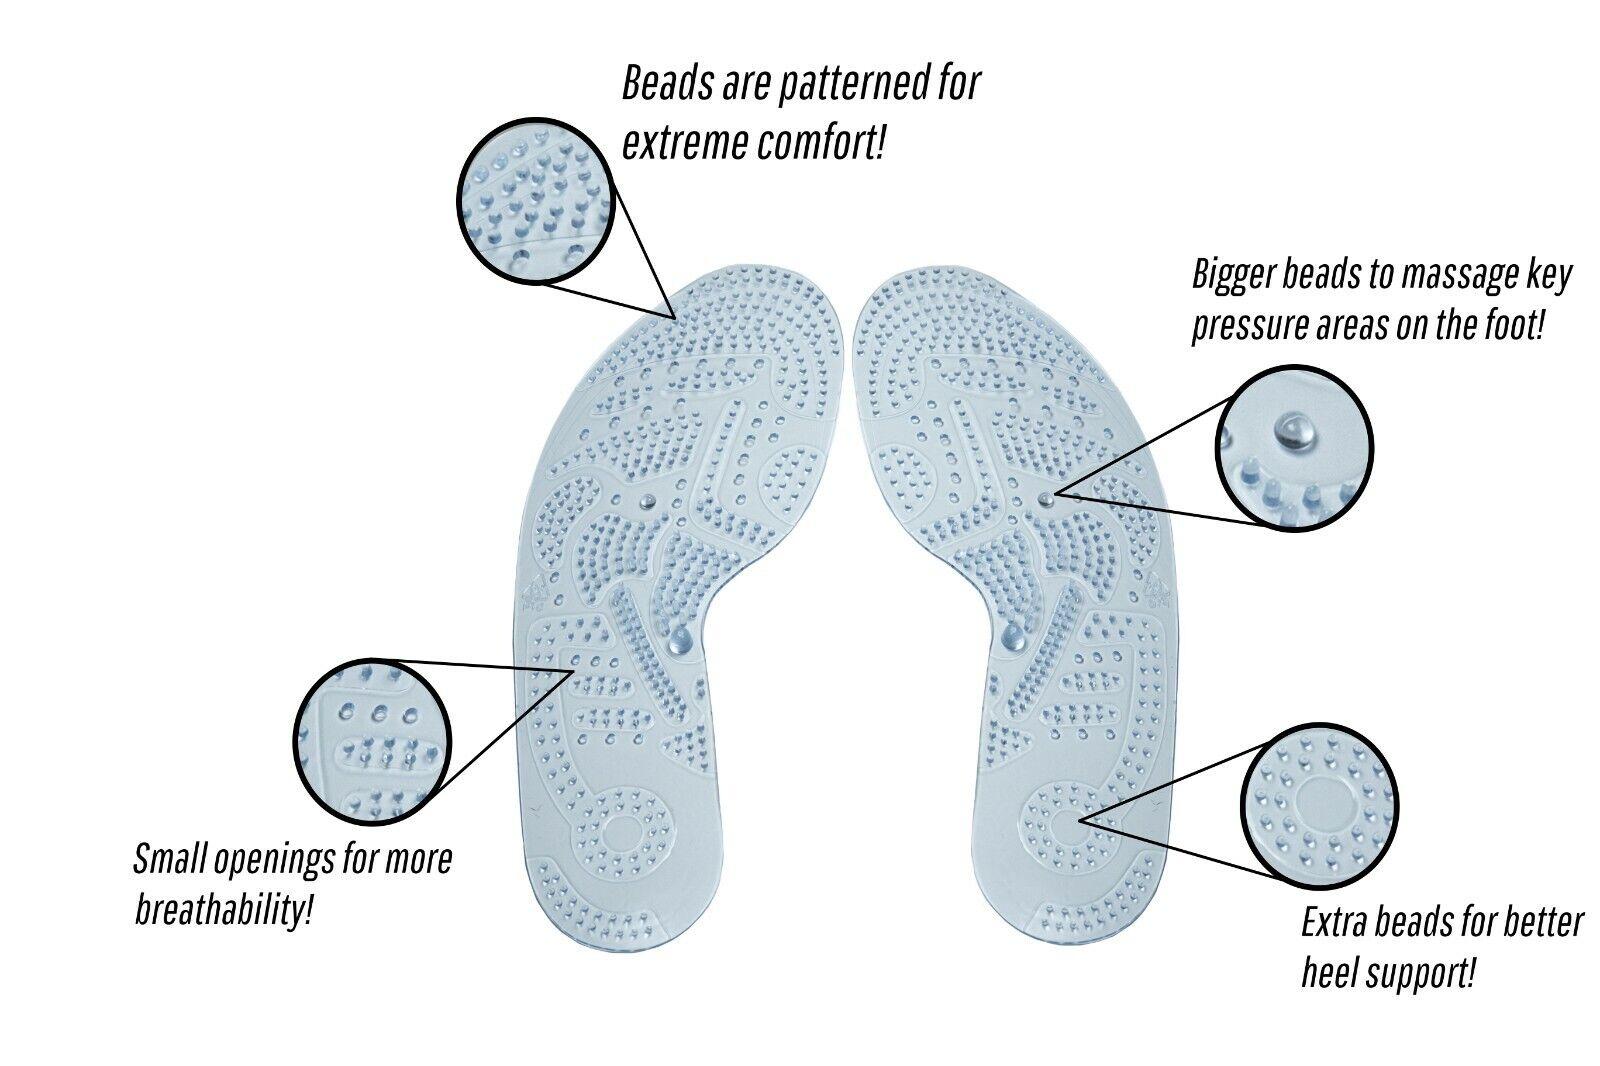 Acupressure Insoles Futzuki Massaging Foot Spa Women Men Washable and Cutable Health & Beauty